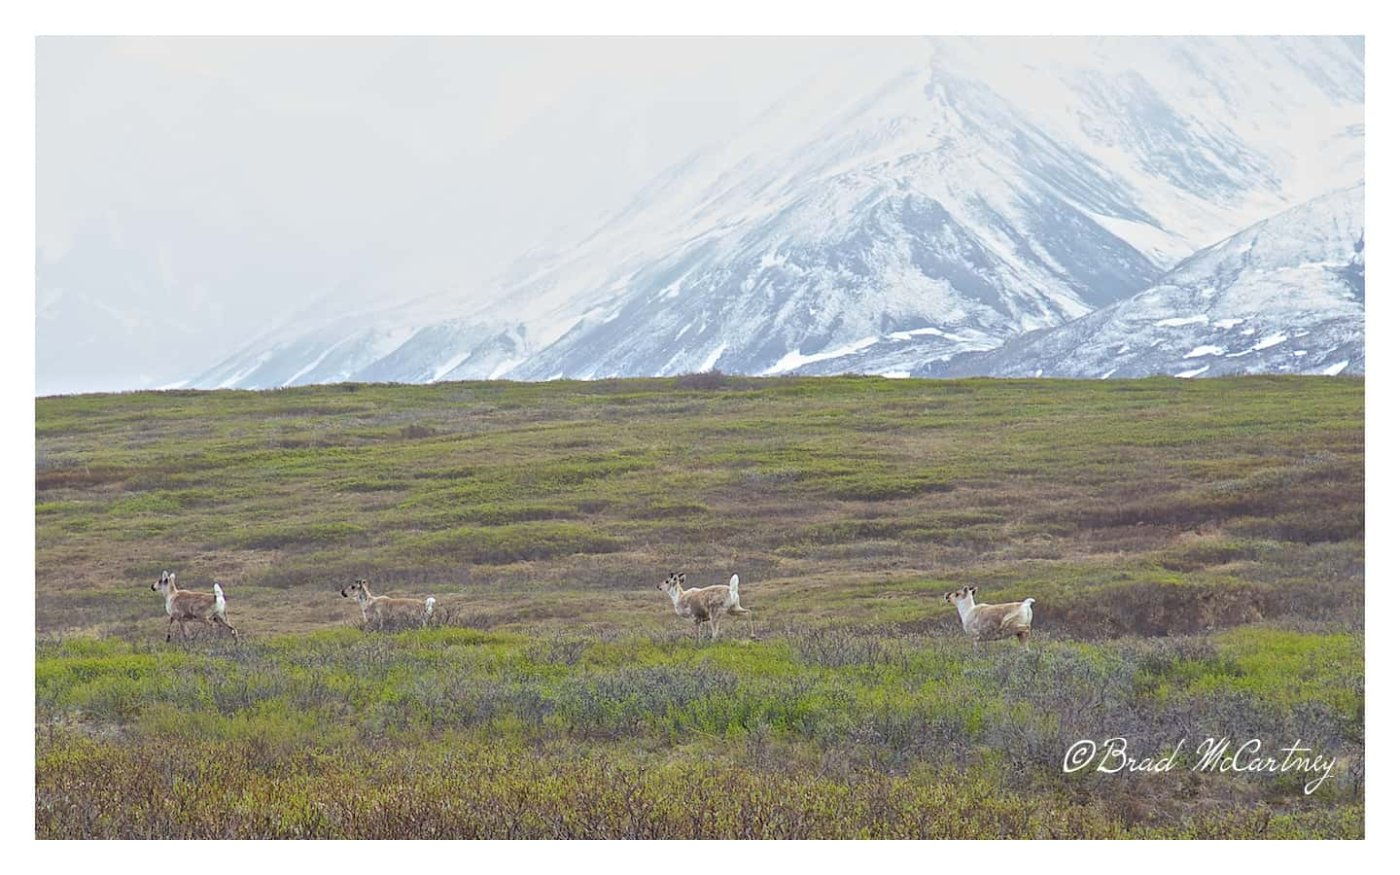 Caribou denali national park